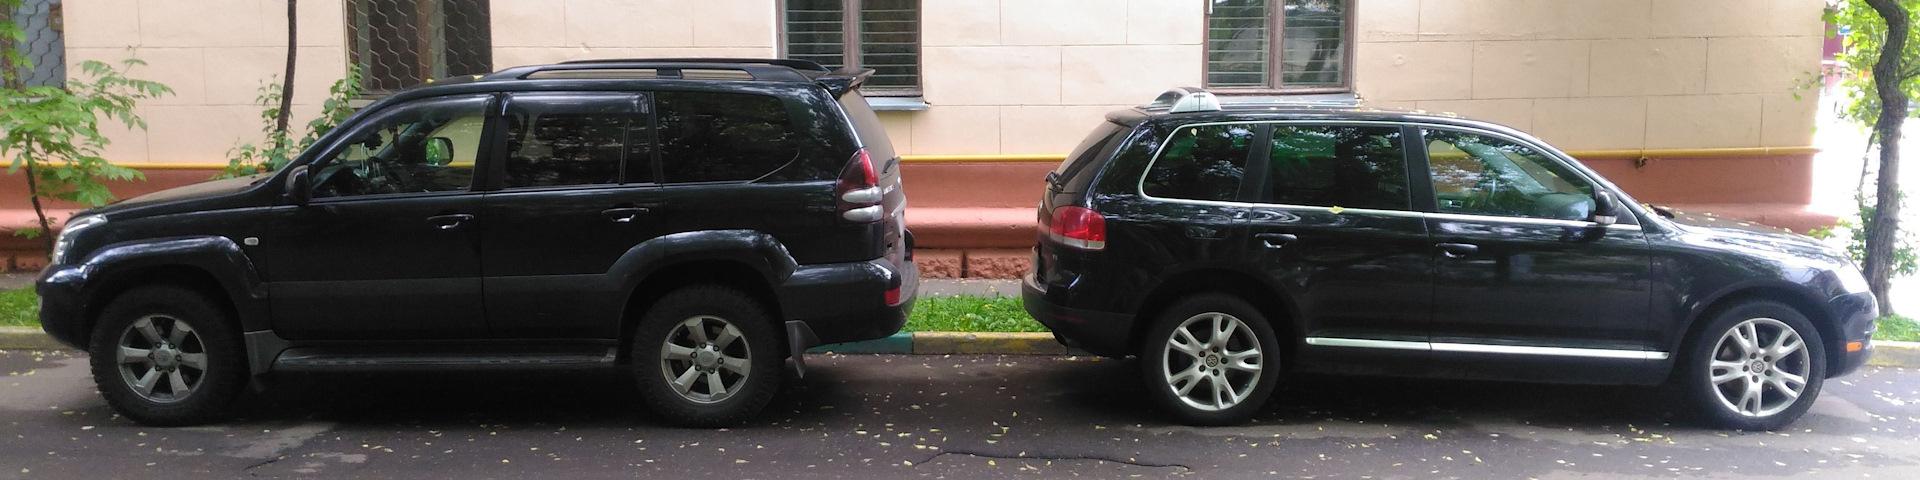 Volkswagen Touareg I vs Toyota Land Cruiser Prado 120